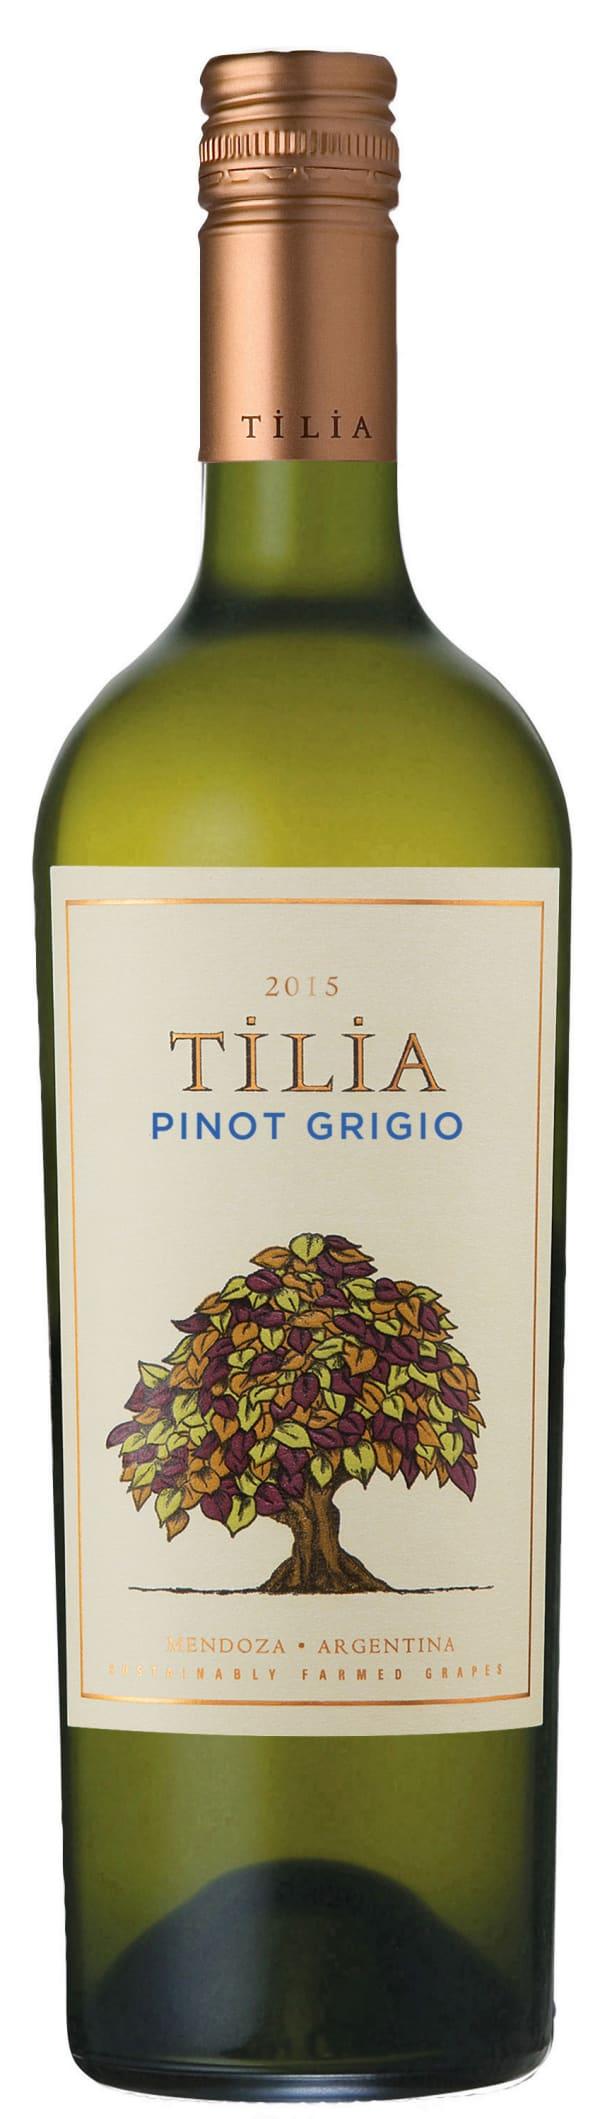 Tilia Pinot Grigio 2017